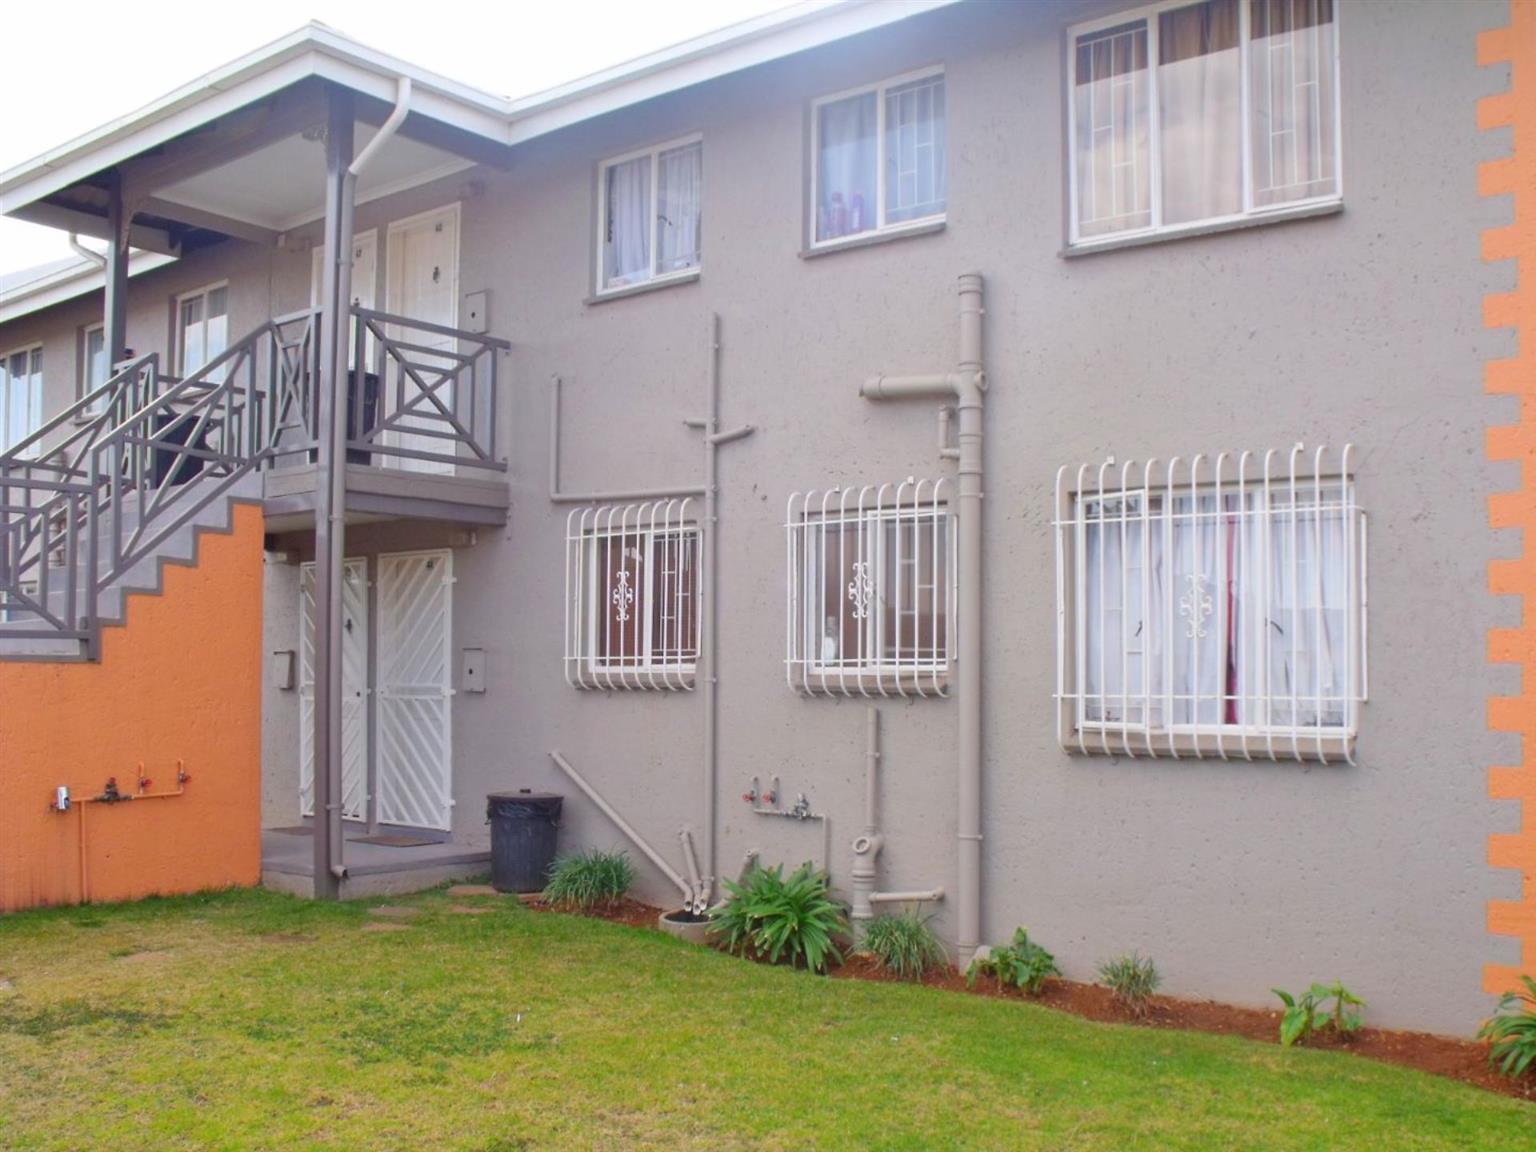 Townhouse Rental Monthly in GLEN MARAIS